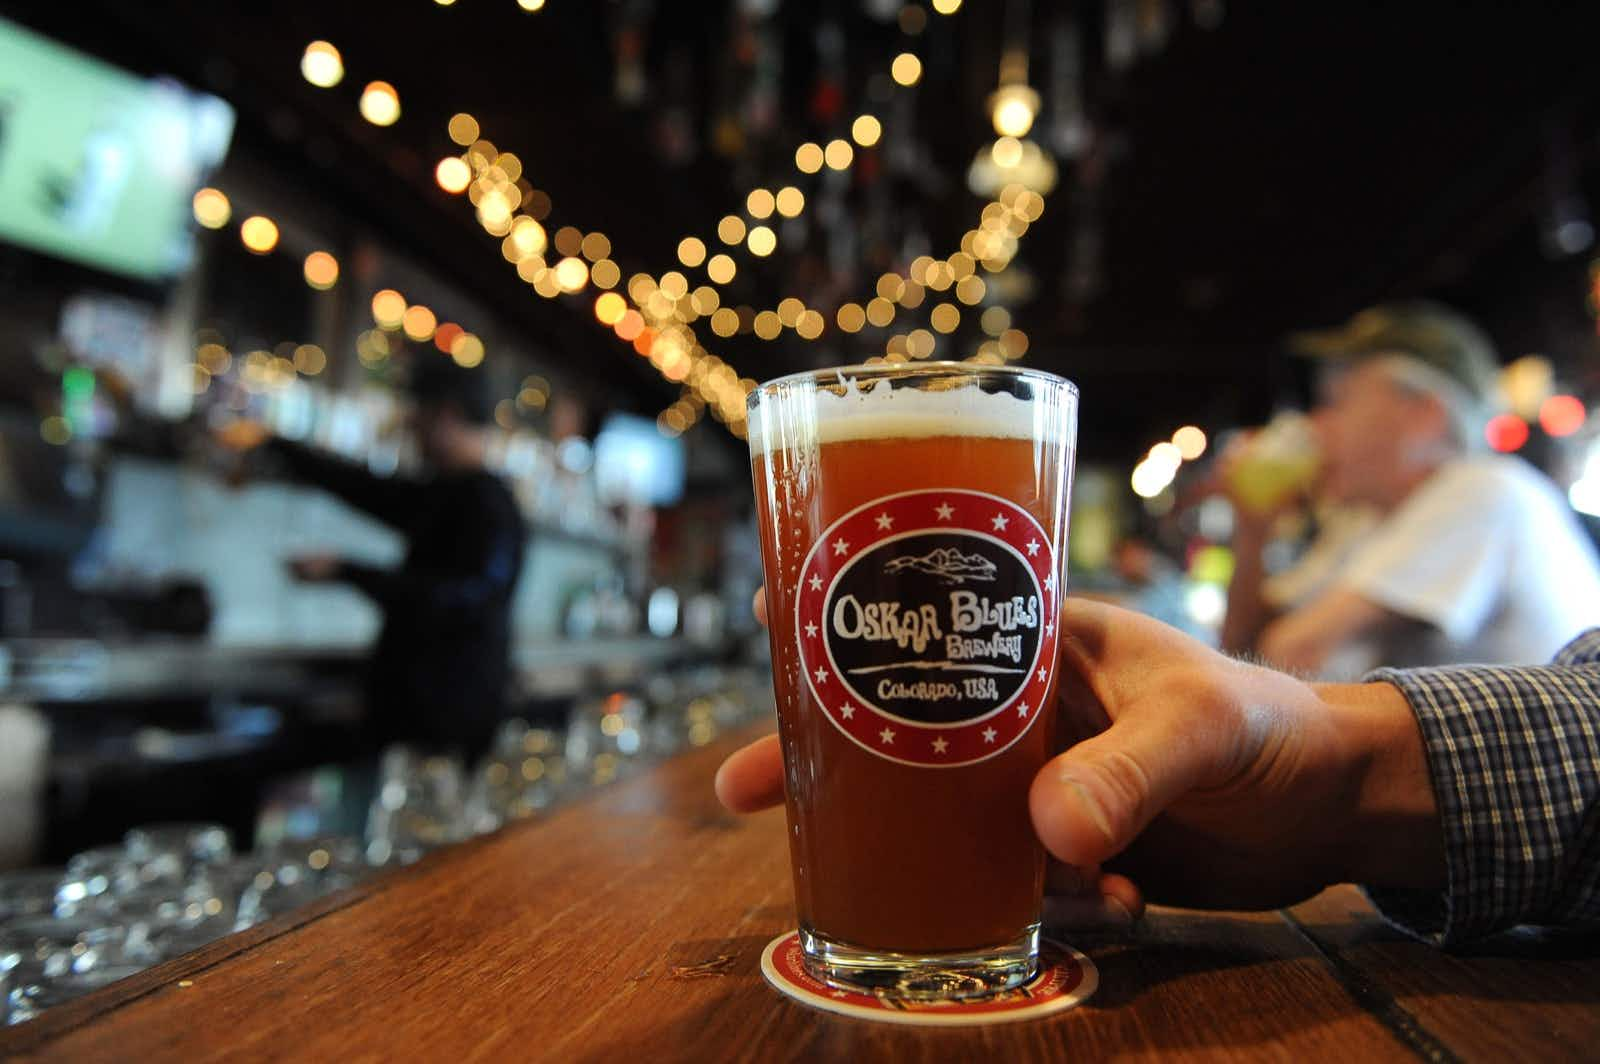 Oskar Blues' most popular beer is the Dale's Pale Ale seen in a glass on the counter of Oskar Blues restaurant in Longmont.